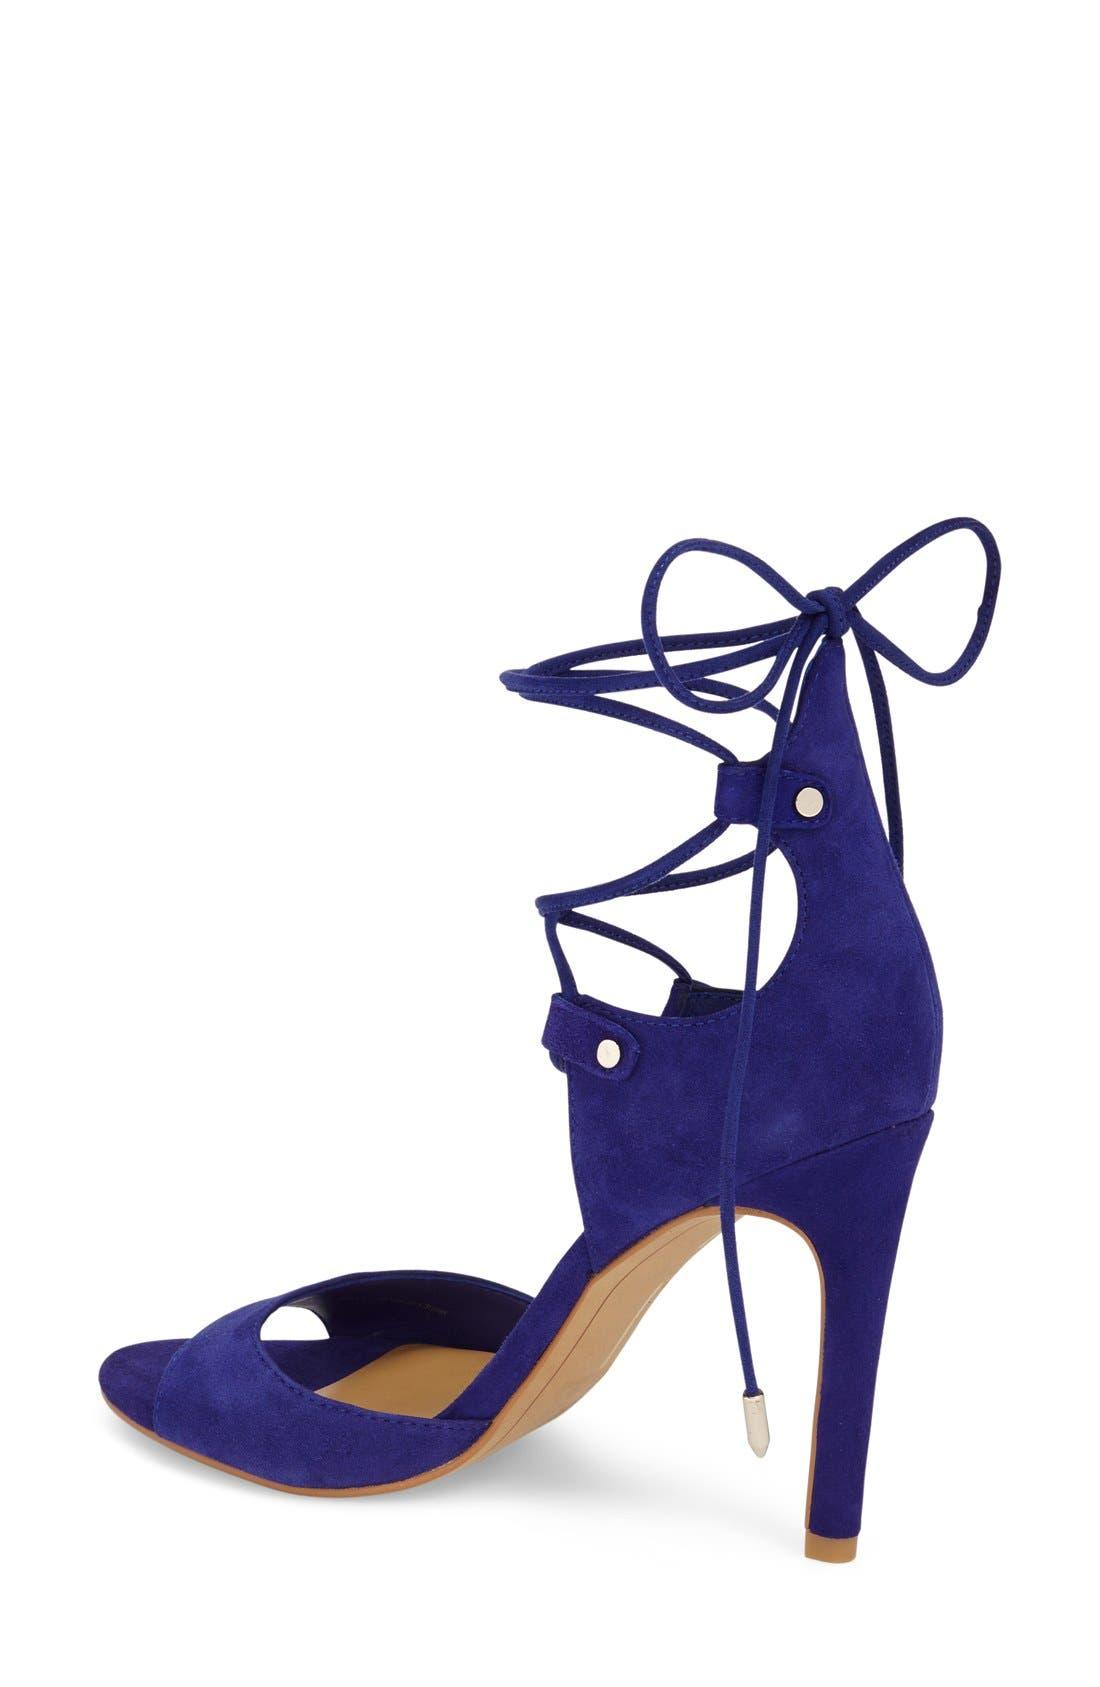 'Hazely' Lace-Up Sandal,                             Alternate thumbnail 2, color,                             Blue Suede